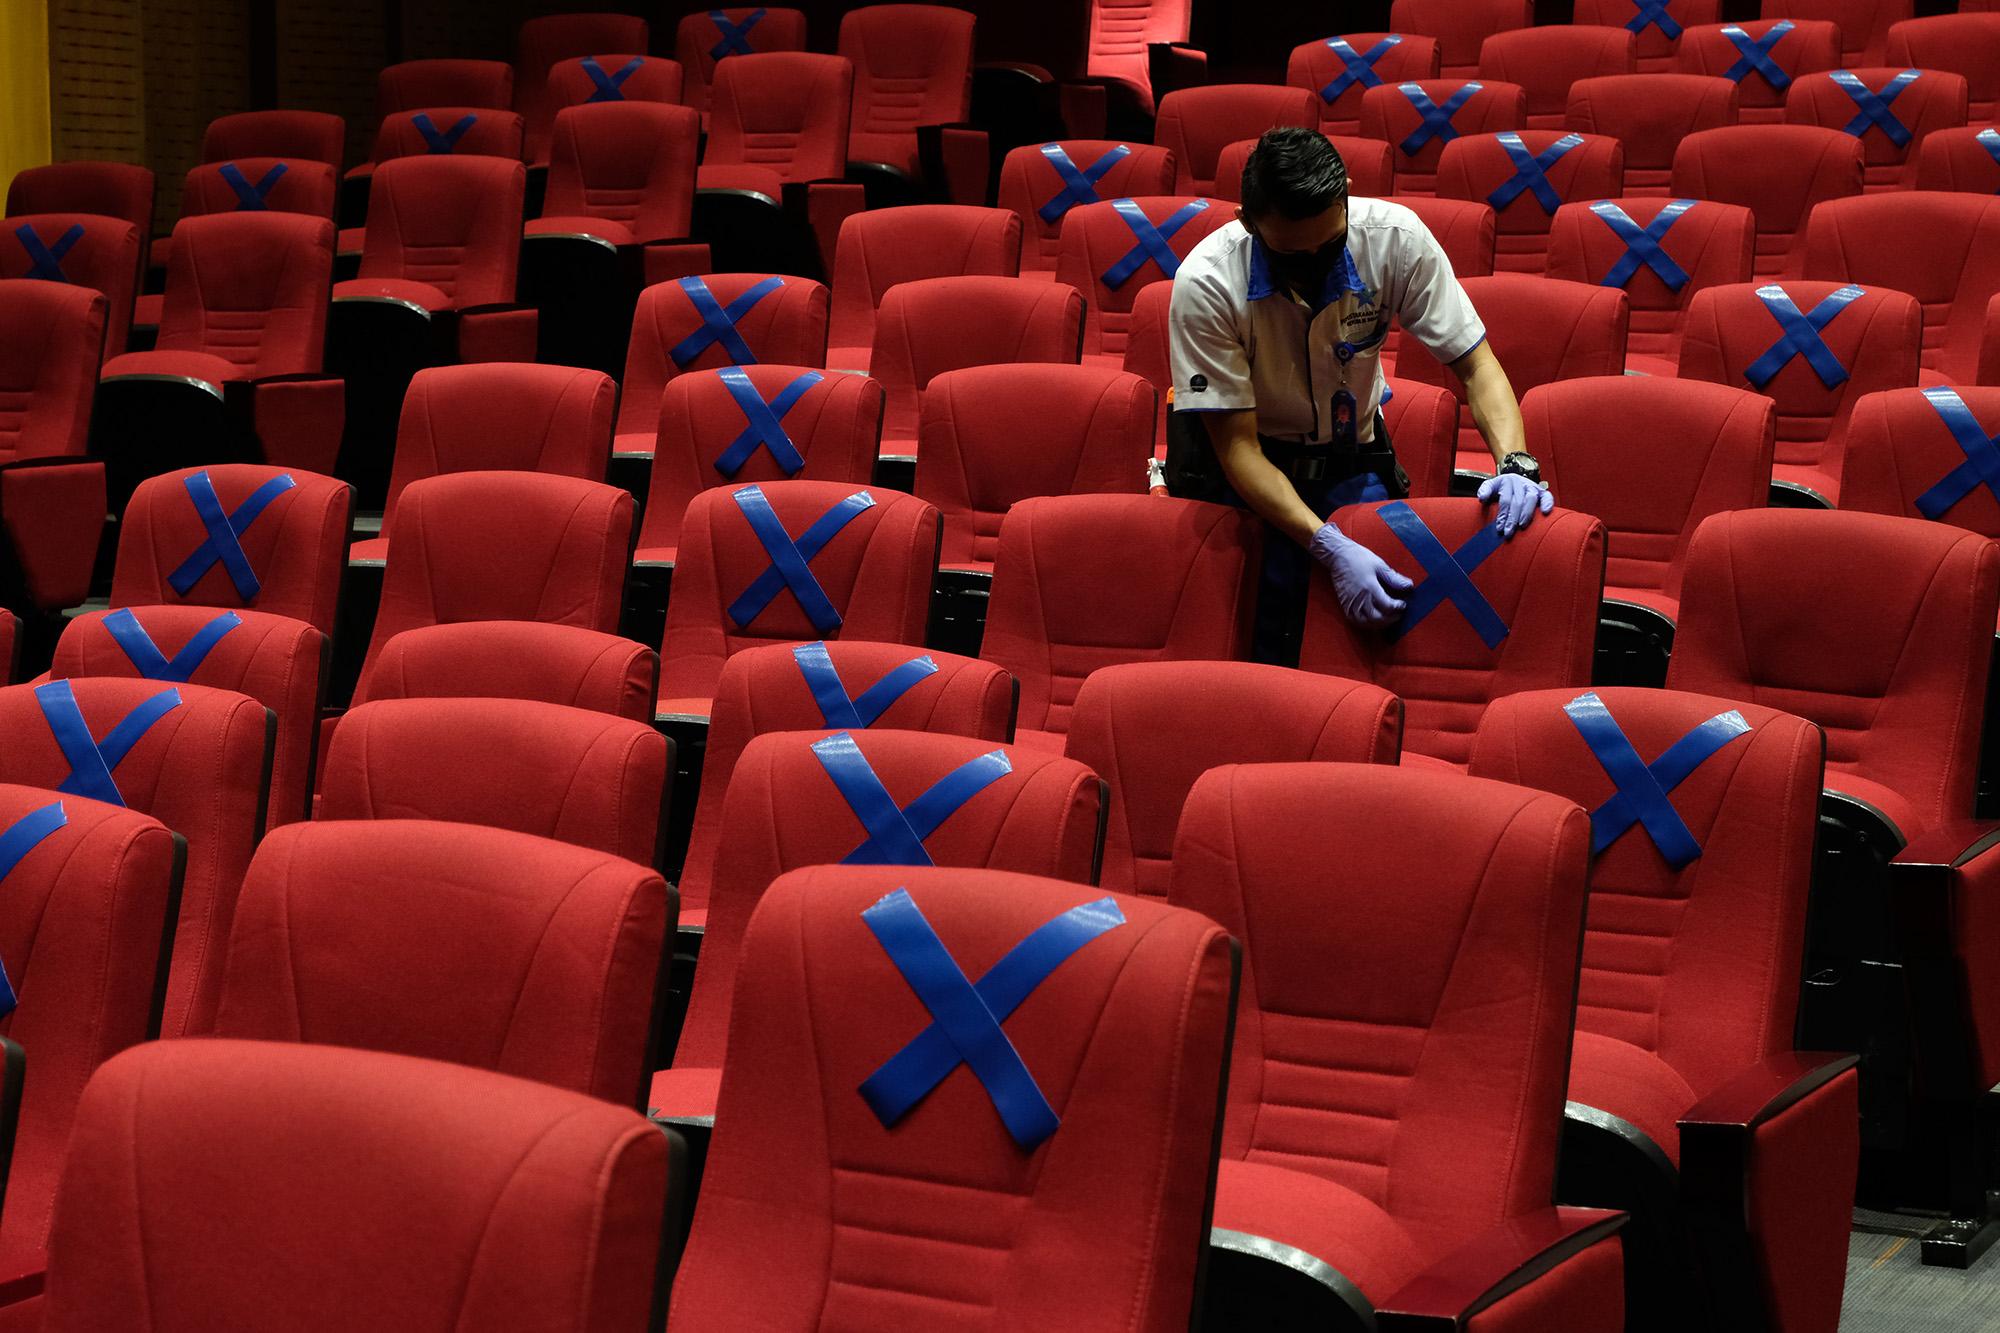 Ridwan Kamil belum izinkan bioskop buka di Jawa Barat - TrenAsia